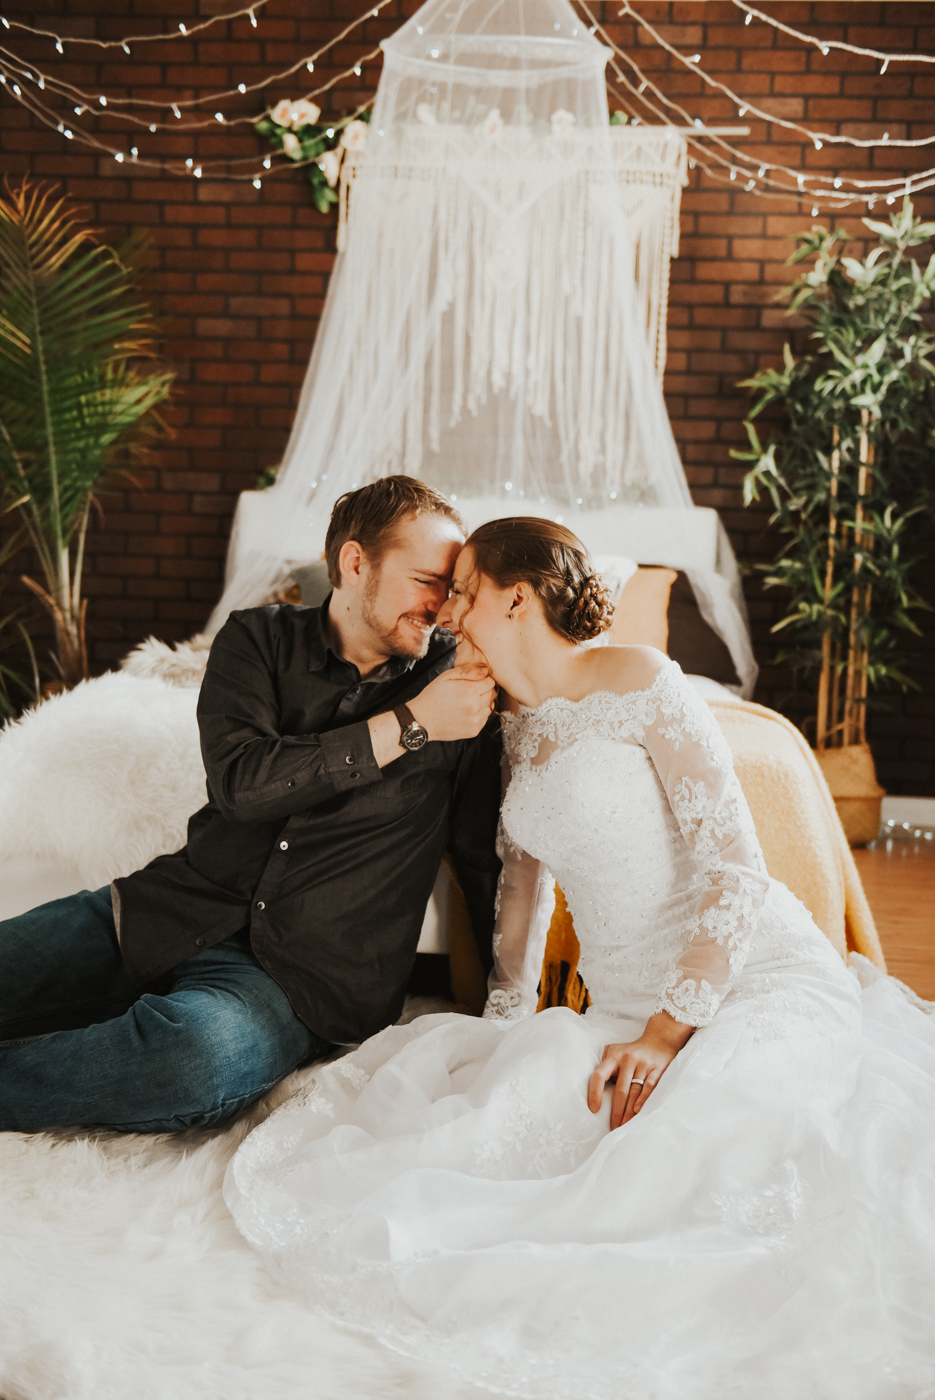 FortSt.John_photographer_TyraEPhotography_Wedding_Couple_Family_Photograhy_DawsonCreek_Elopement_Bride_Boduoir_Portraits-3.jpg